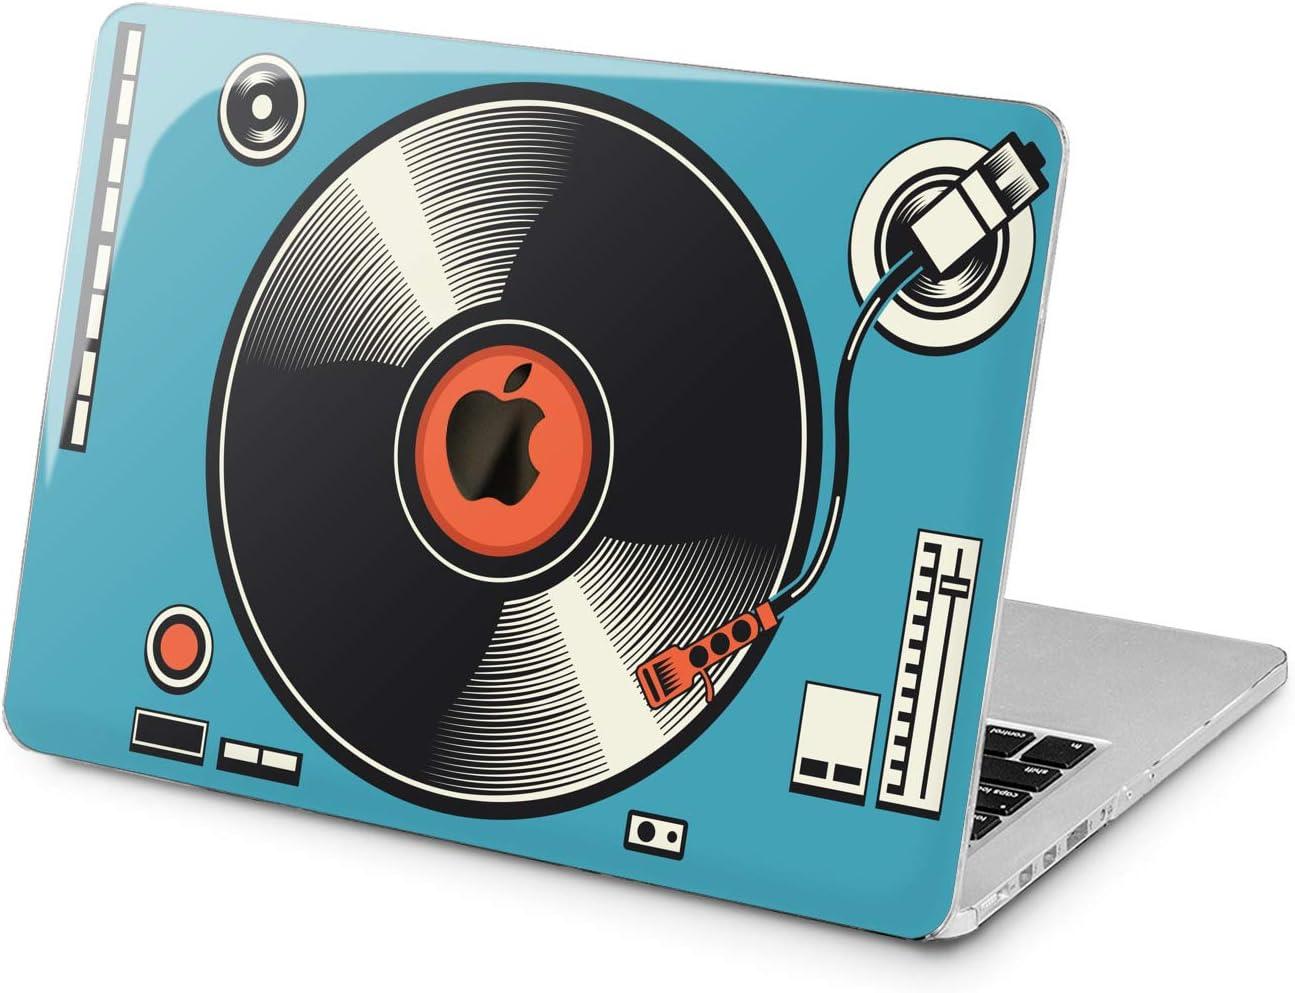 "Cavka Hard Shell Case for Apple MacBook Pro 13"" A2338 2020 Air 13"" A2179 Retina 2015 Mac 11"" Mac 12"" Retro Glam Print Laptop Blue Vinyl Vintage Design Protective Plastic Cover Art Graphic Player"